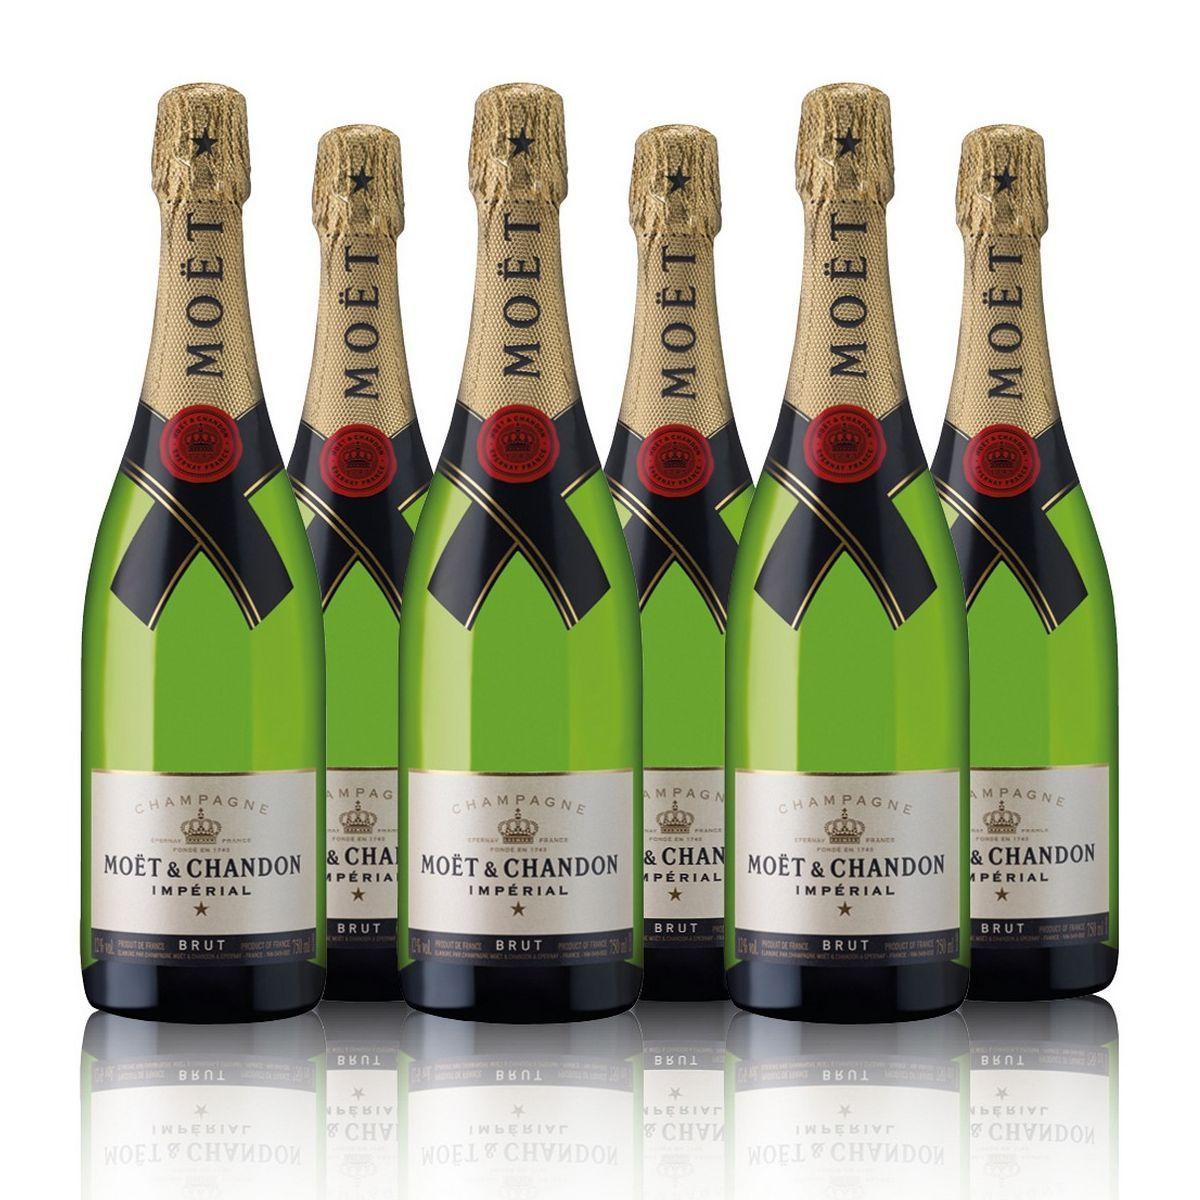 Moet & Chandon Brut Imperial In Gift Box 6 Bottles